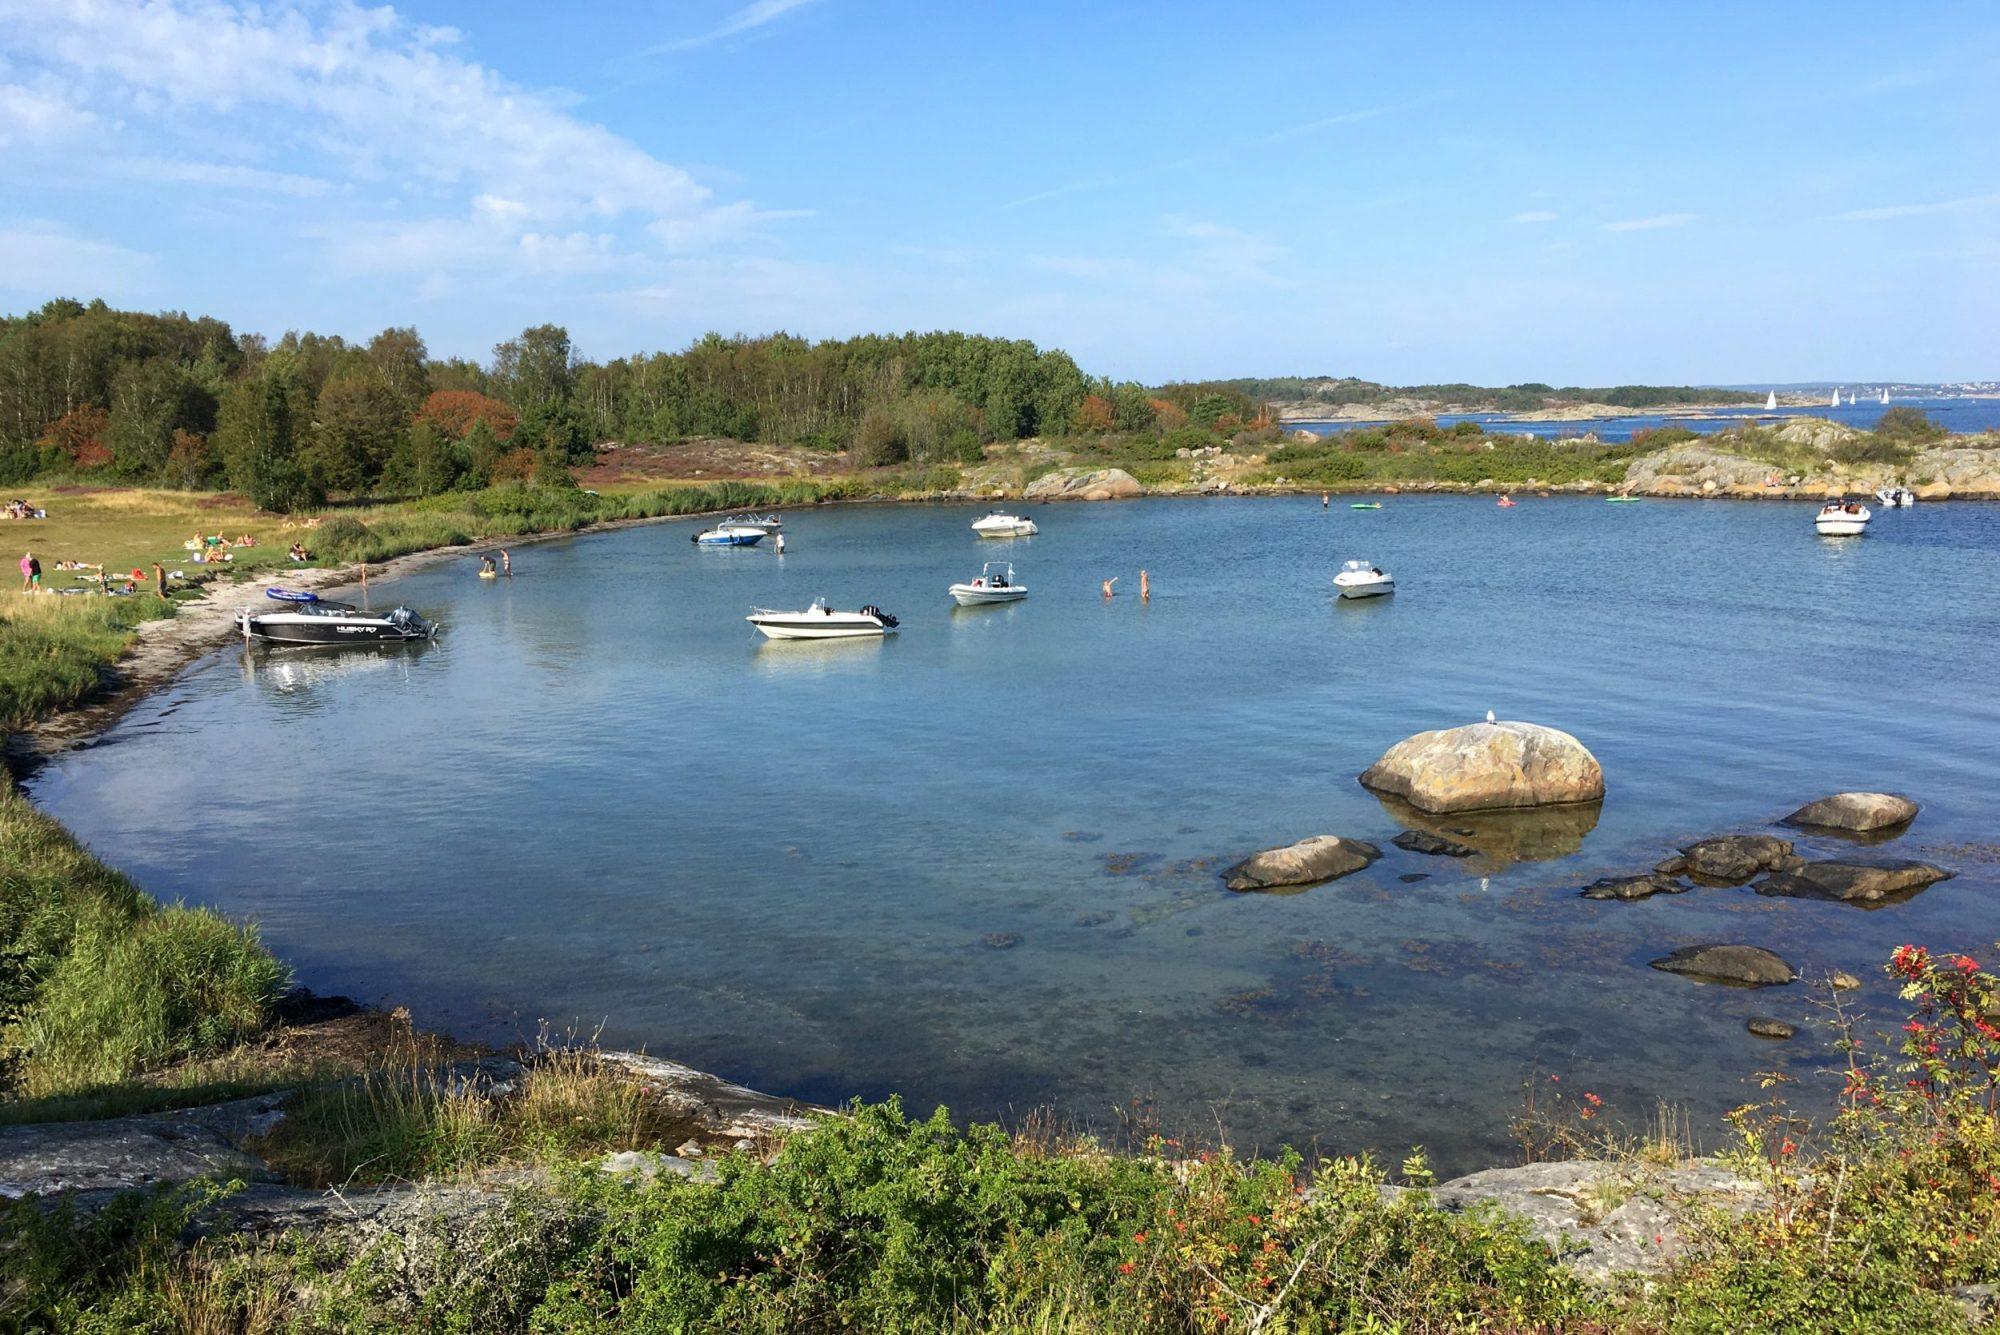 Baai op het eiland Vrängo